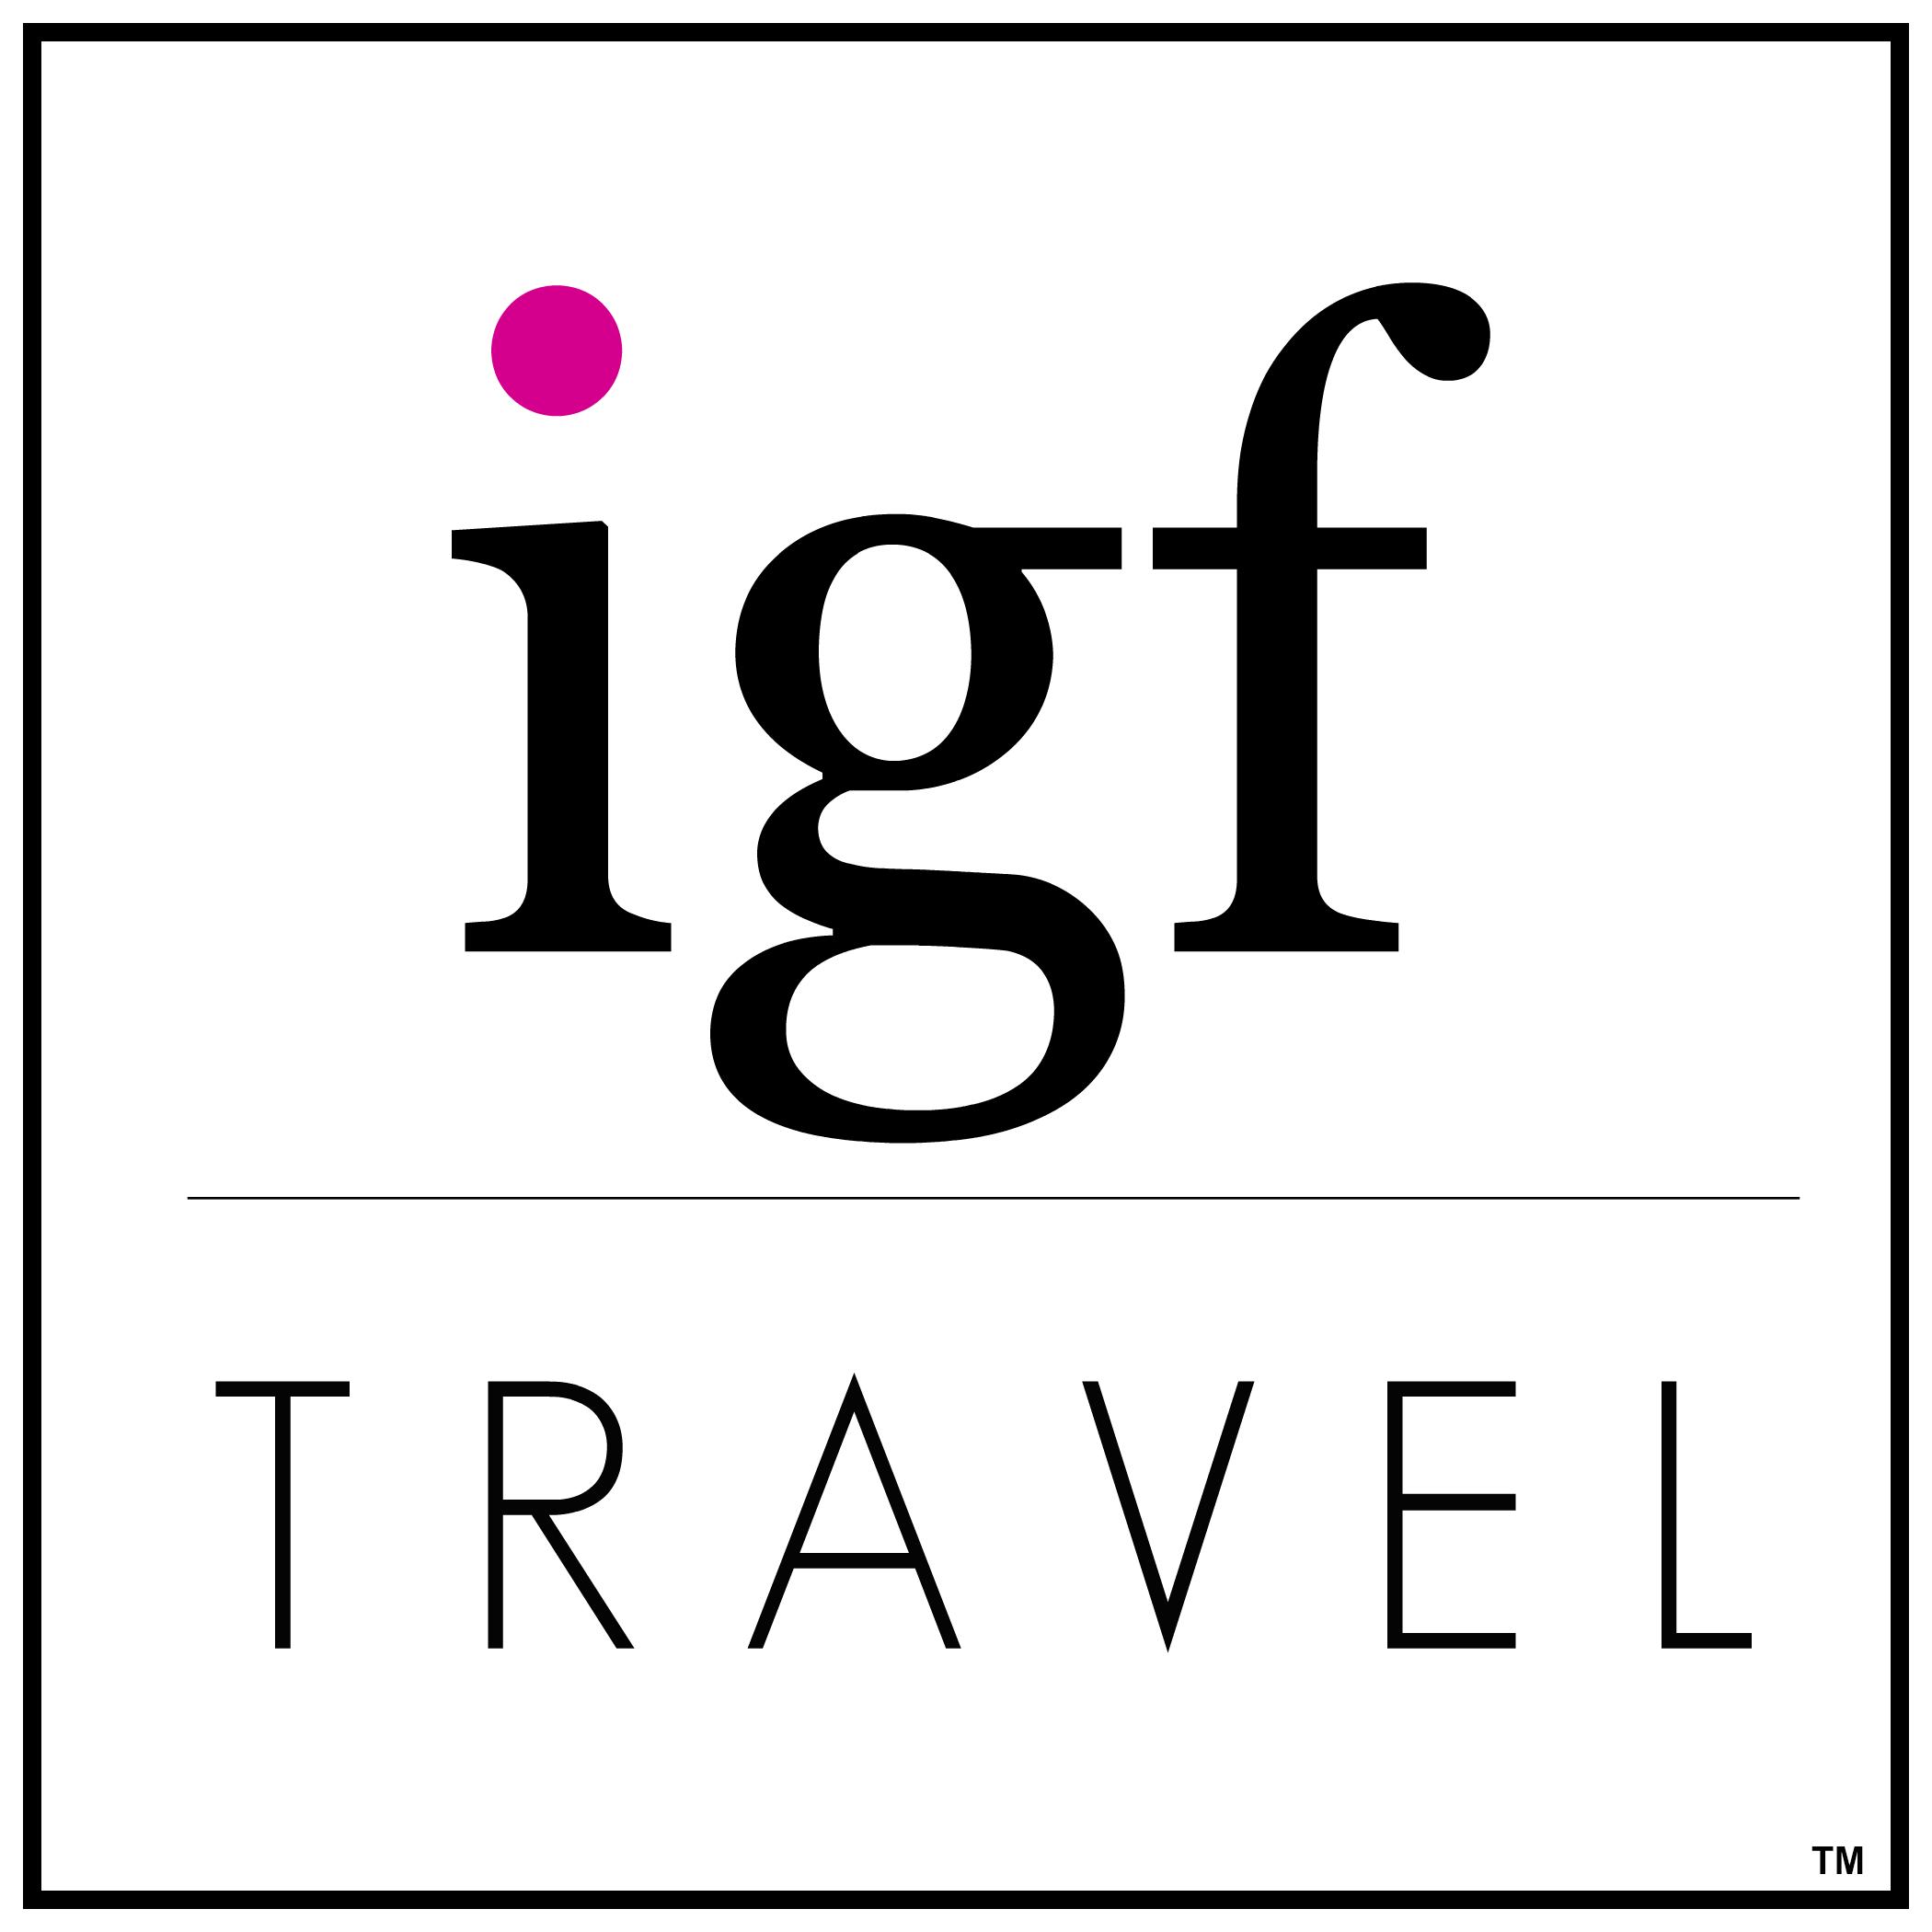 IGFtravel.png